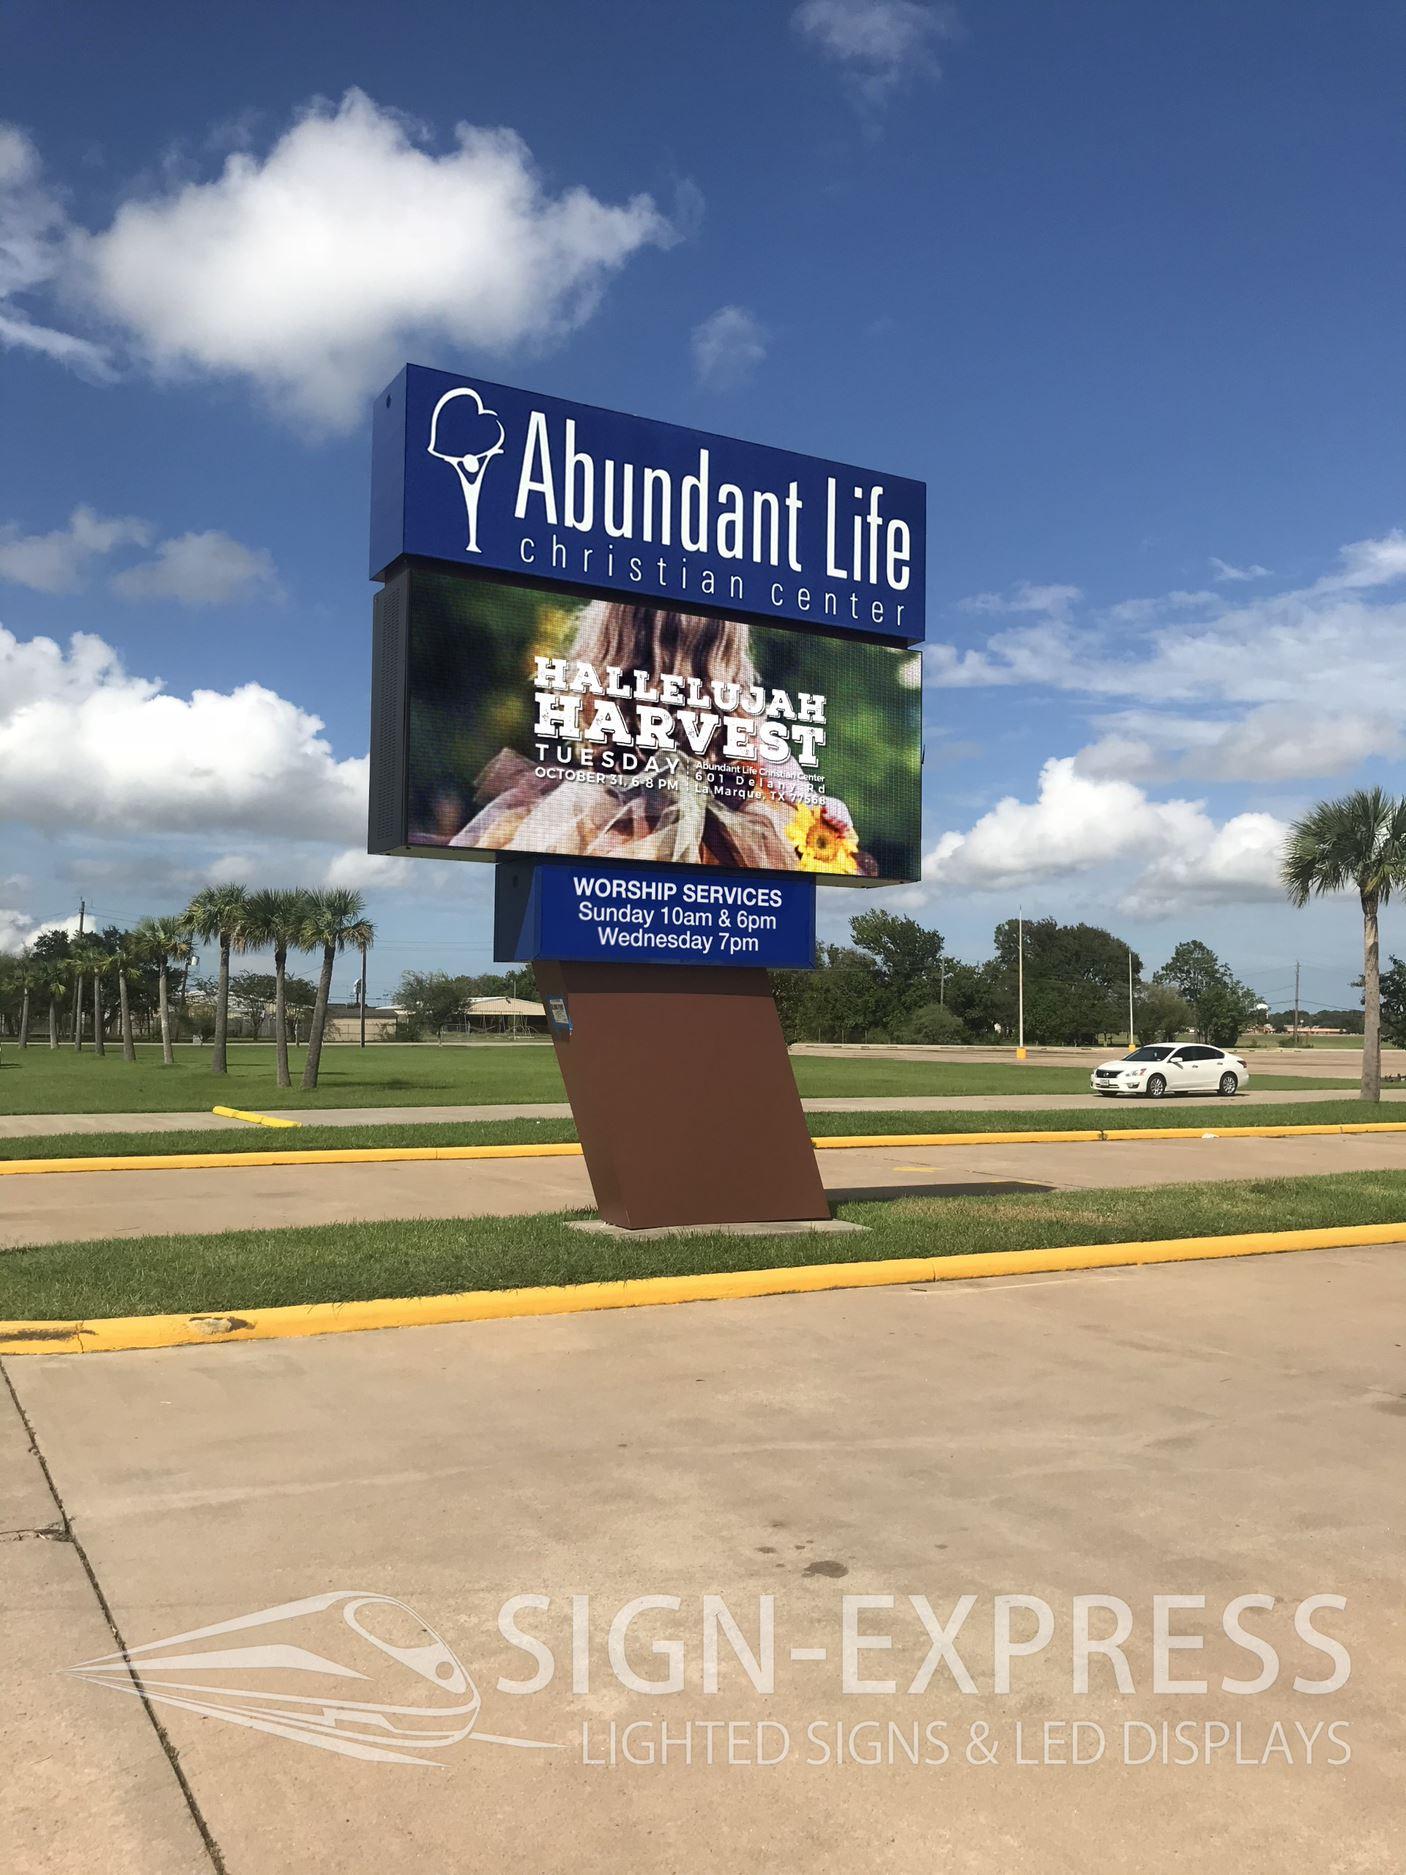 Abundant-Life-Christian-Center-Church-LED-Billboard